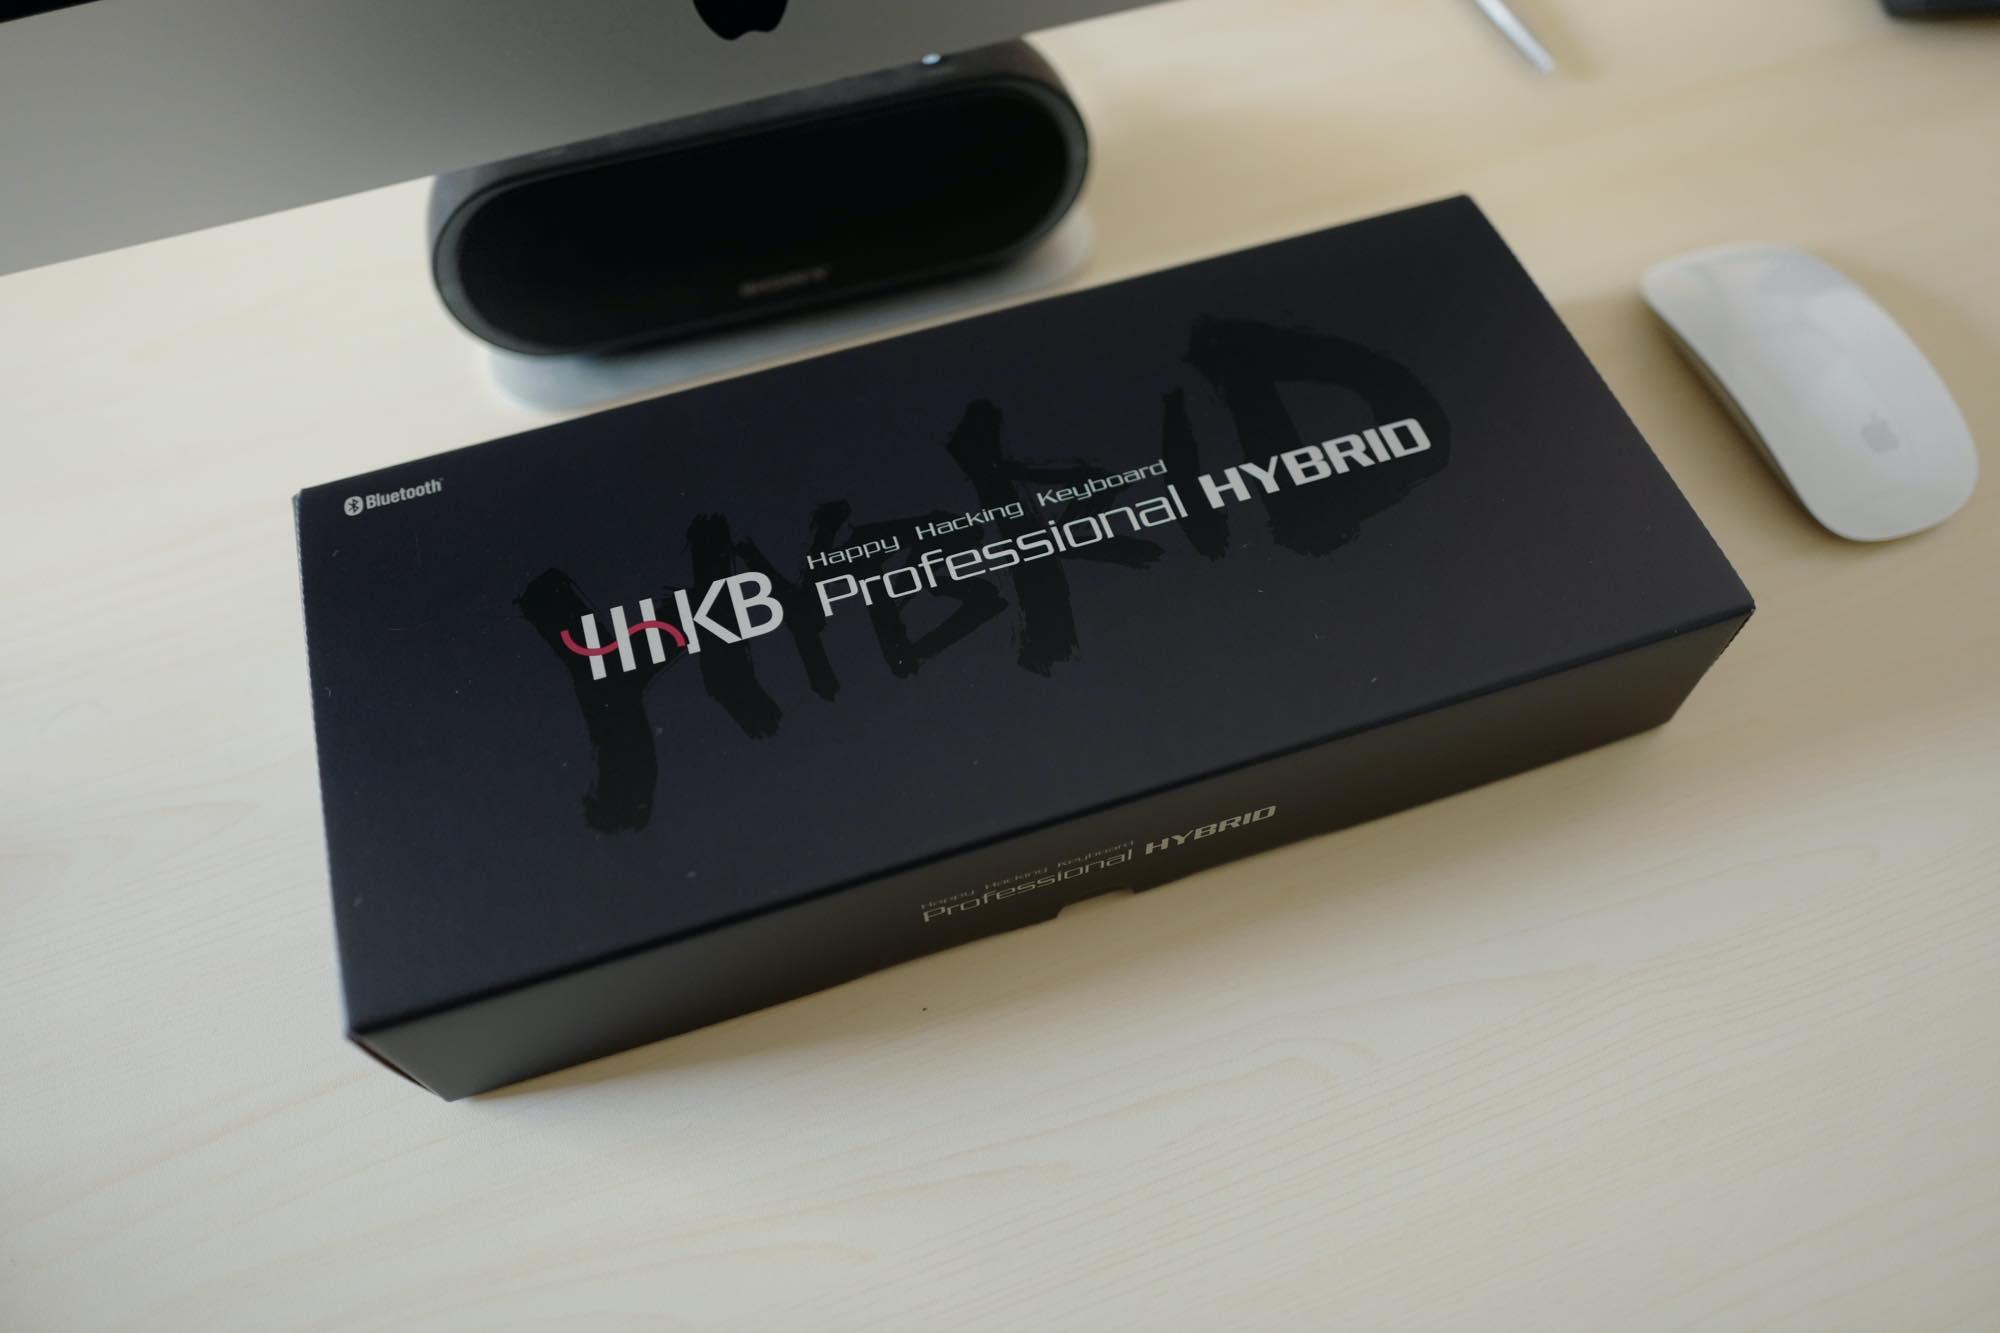 Happy Hacking Keyboard Professional HYBRID Type-S 日本語配列のパッケージ